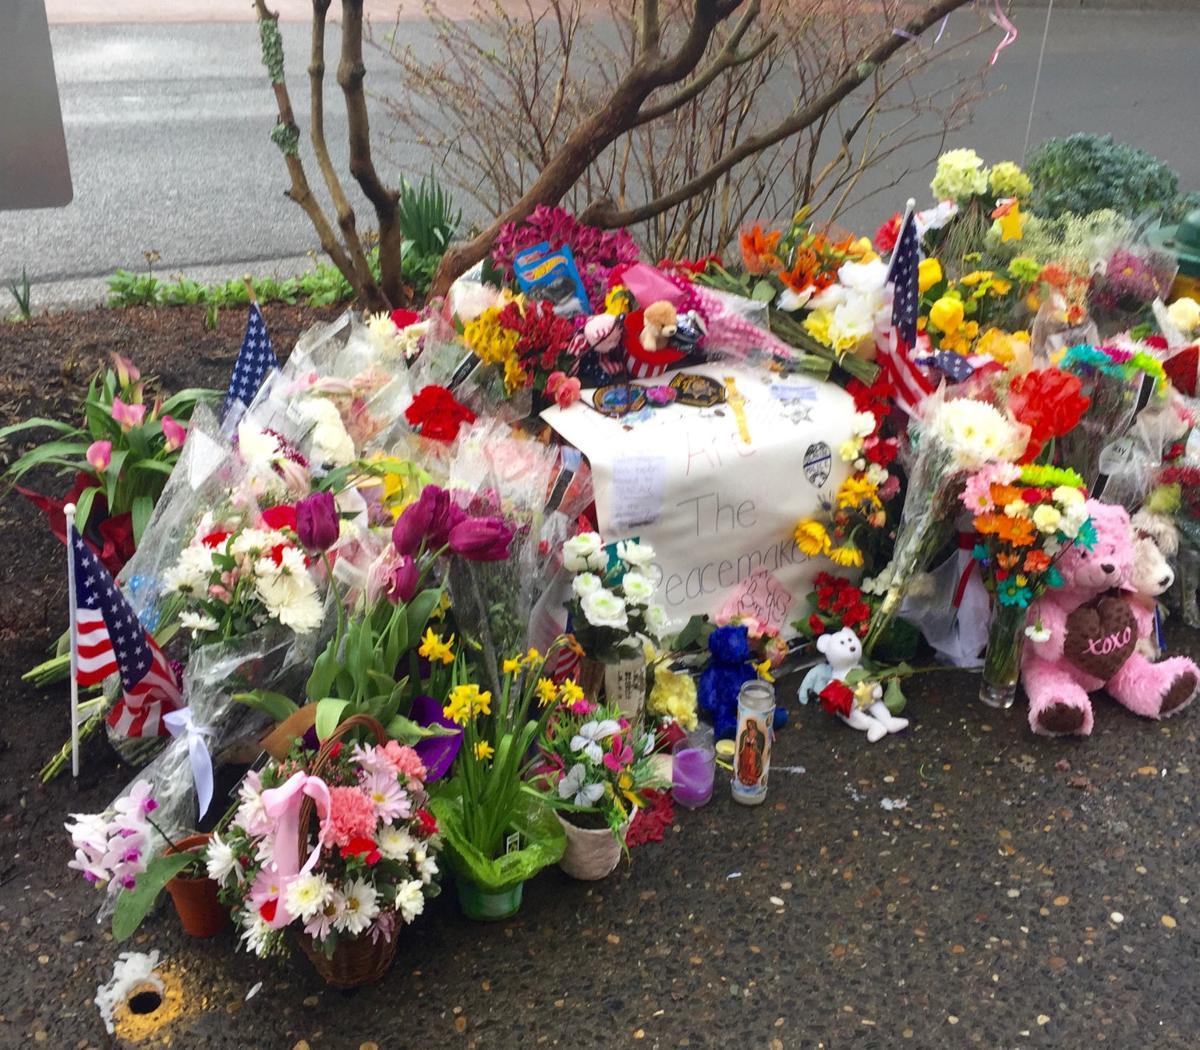 Many honor memory, sacrifice of  Sgt. Goodding